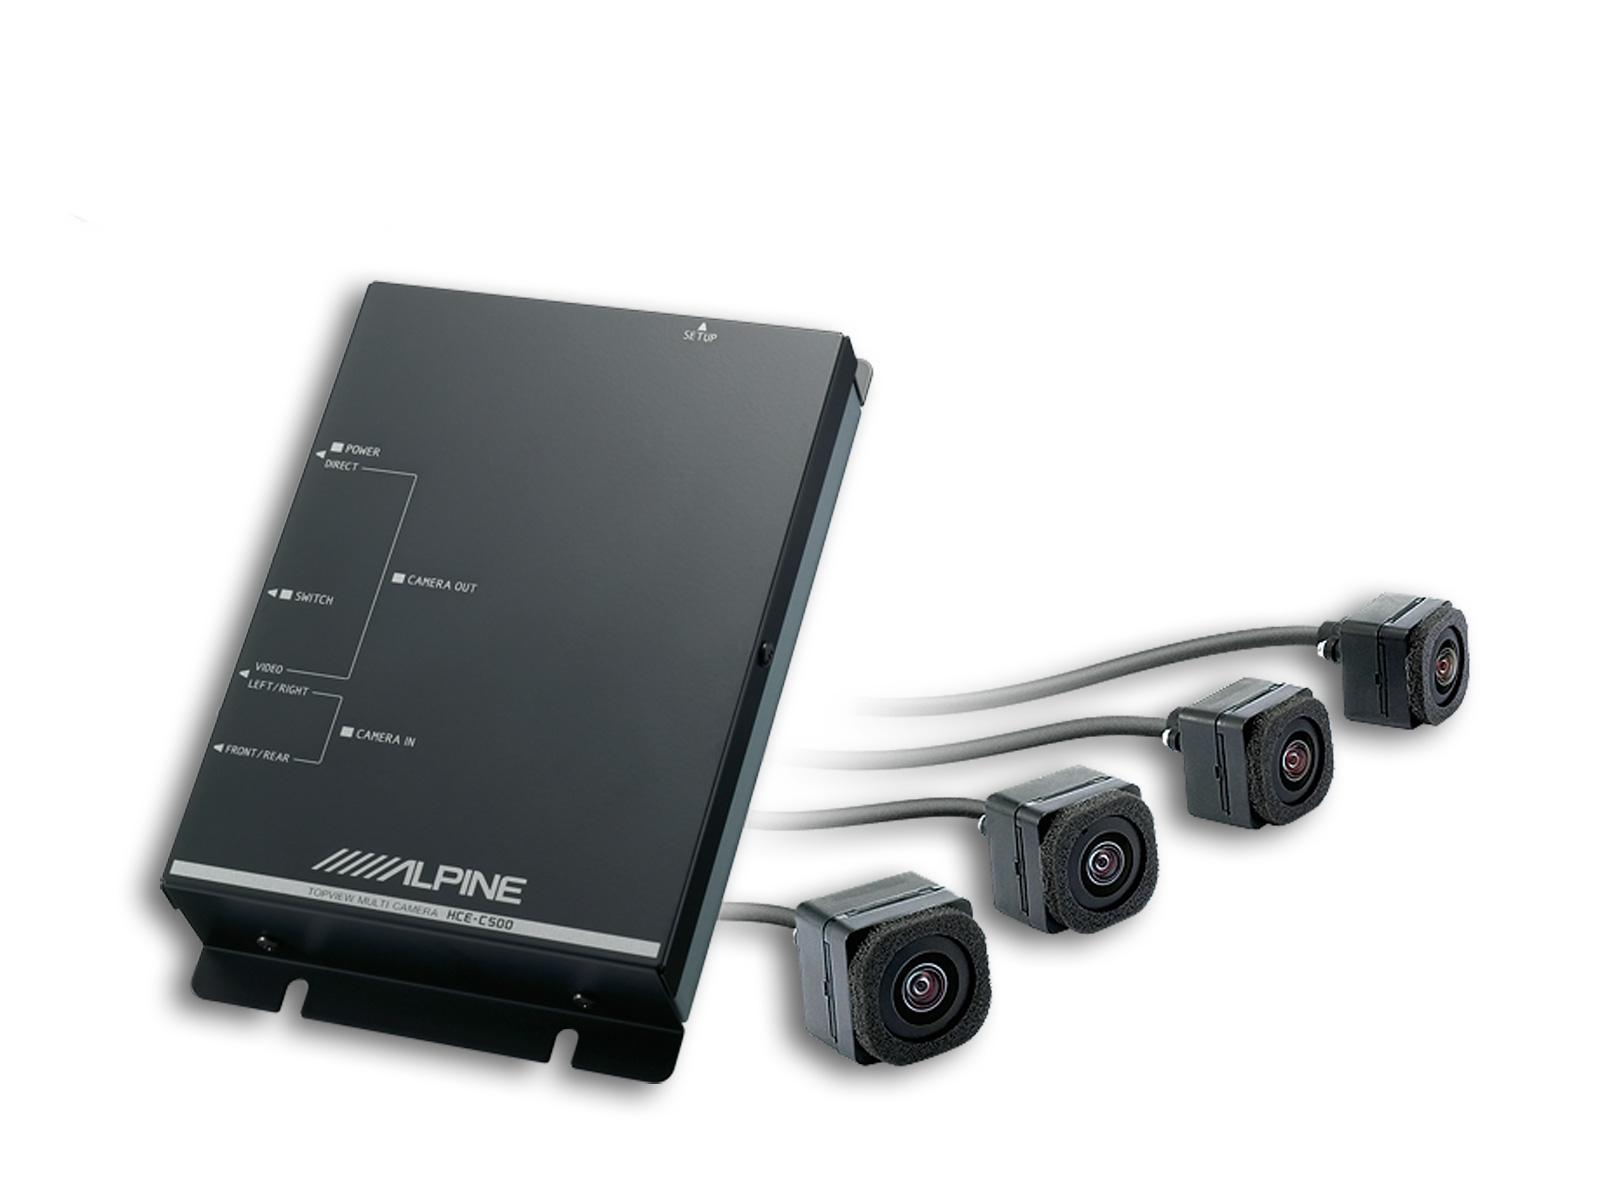 Sistem 4 camere ALPINE HCE-C500X5 pentru BMW X5 (2006-2009)